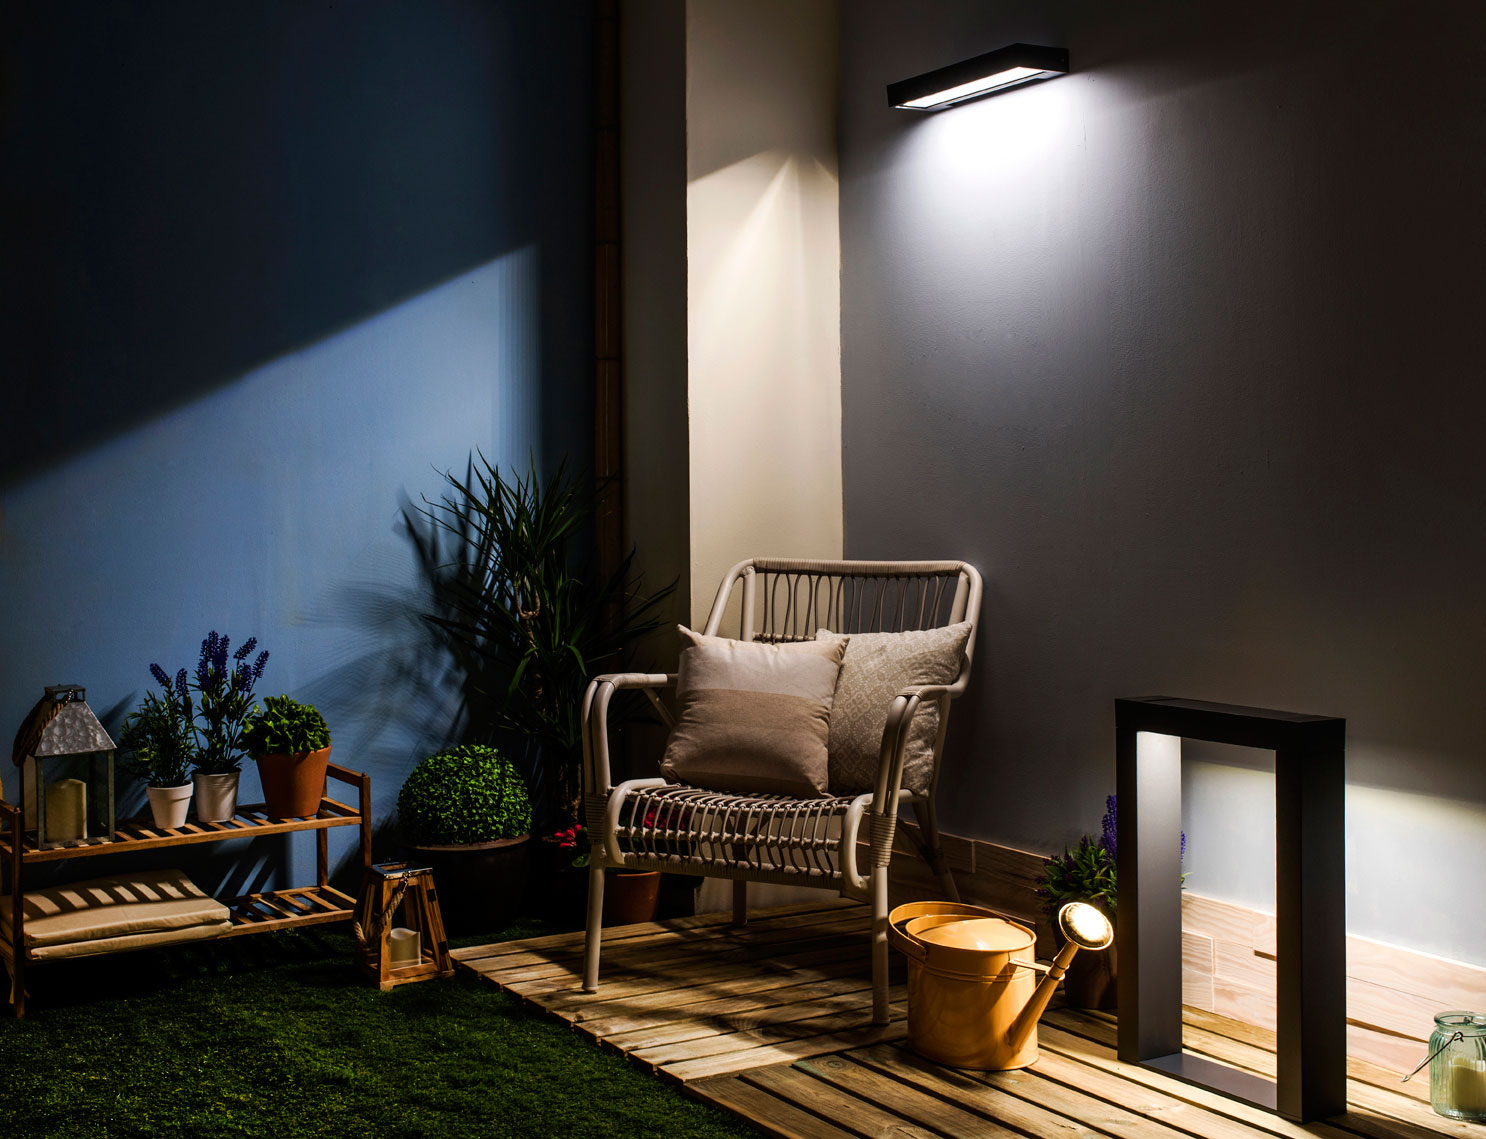 C mo elegir l mparas solares para iluminar el exterior for Apliques iluminacion exterior pared